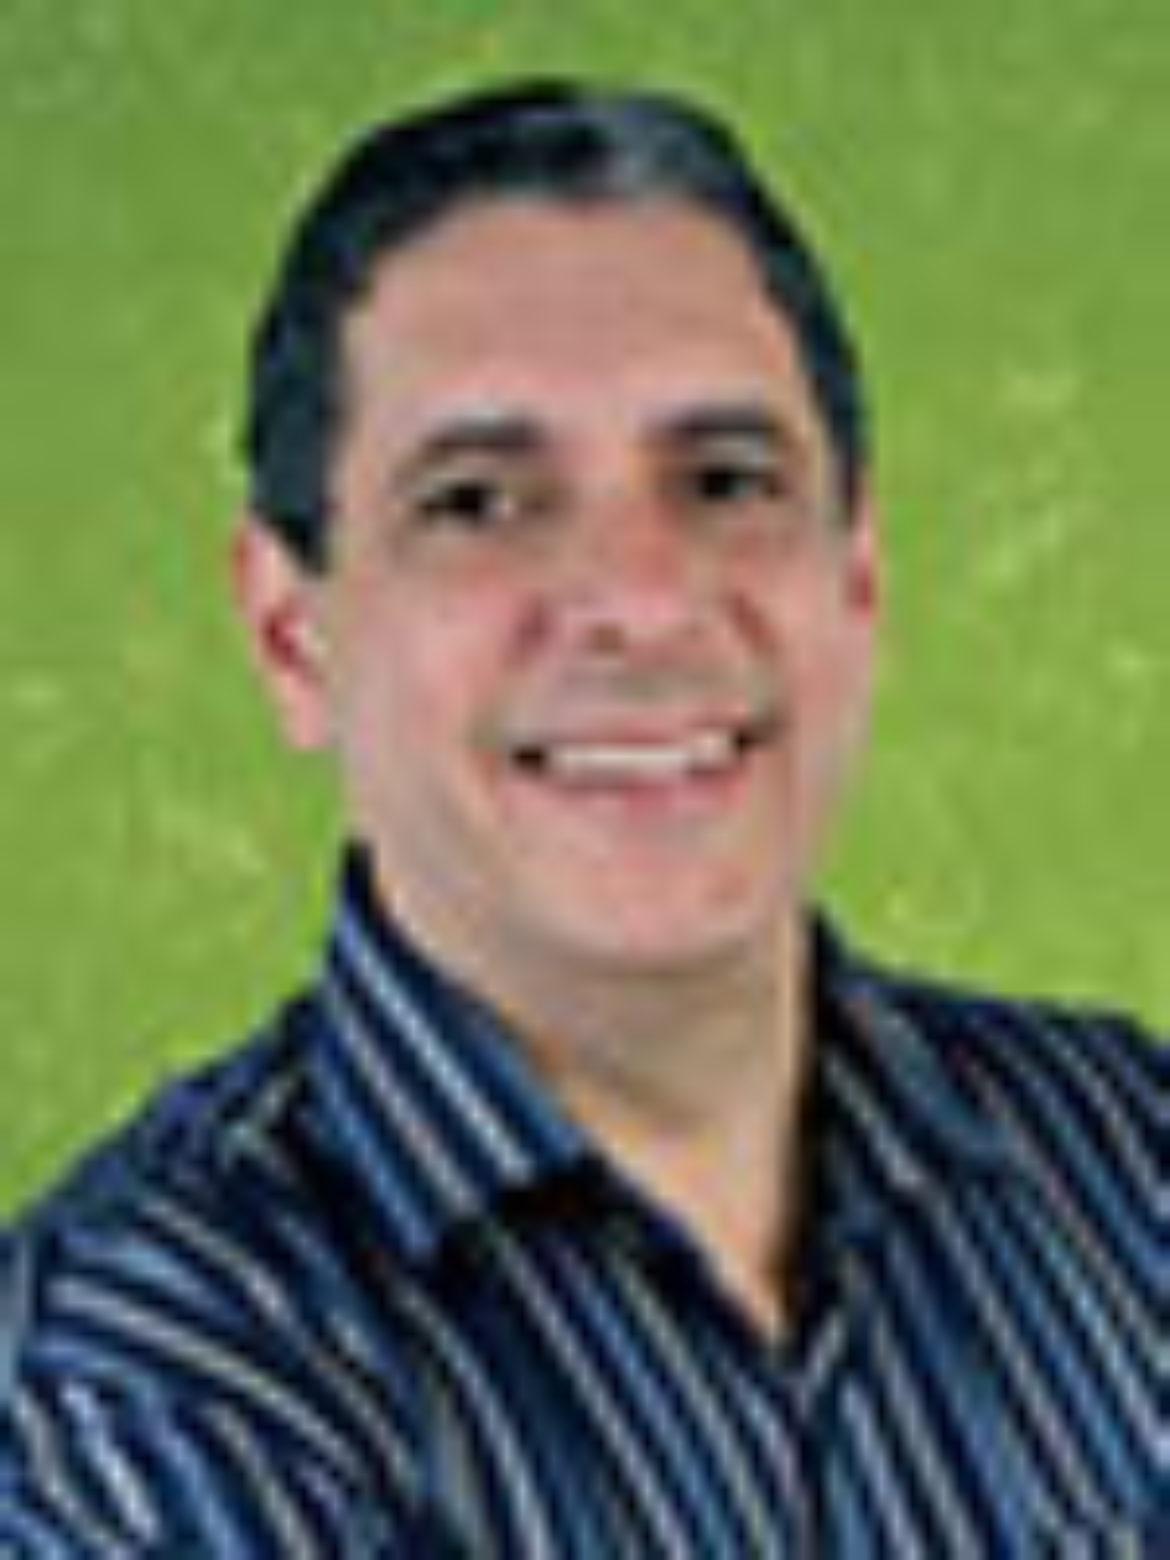 Nilvano Andrade